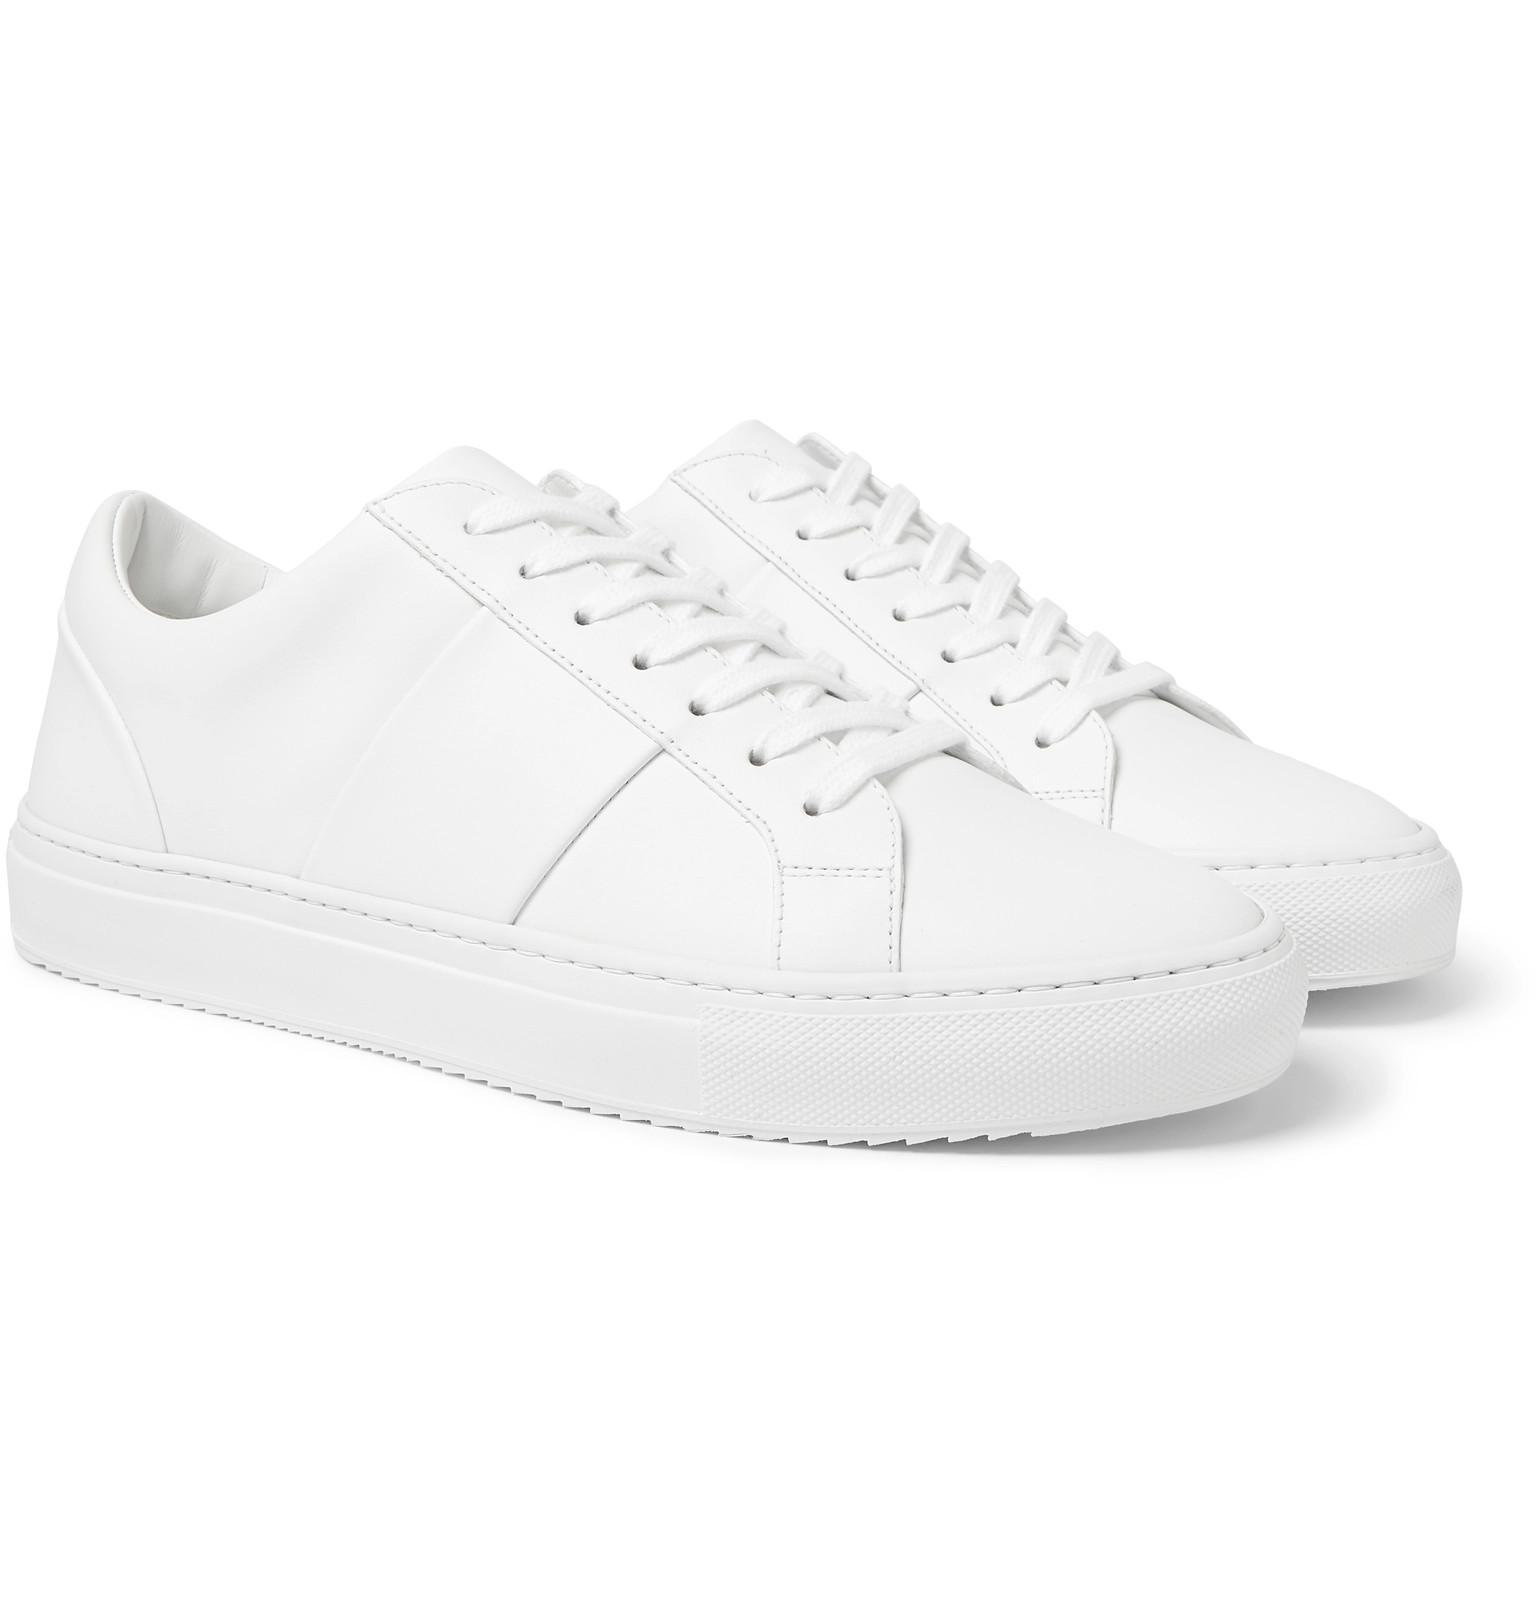 Die besten weißen Sneaker 2020: Mr. P white sneakers